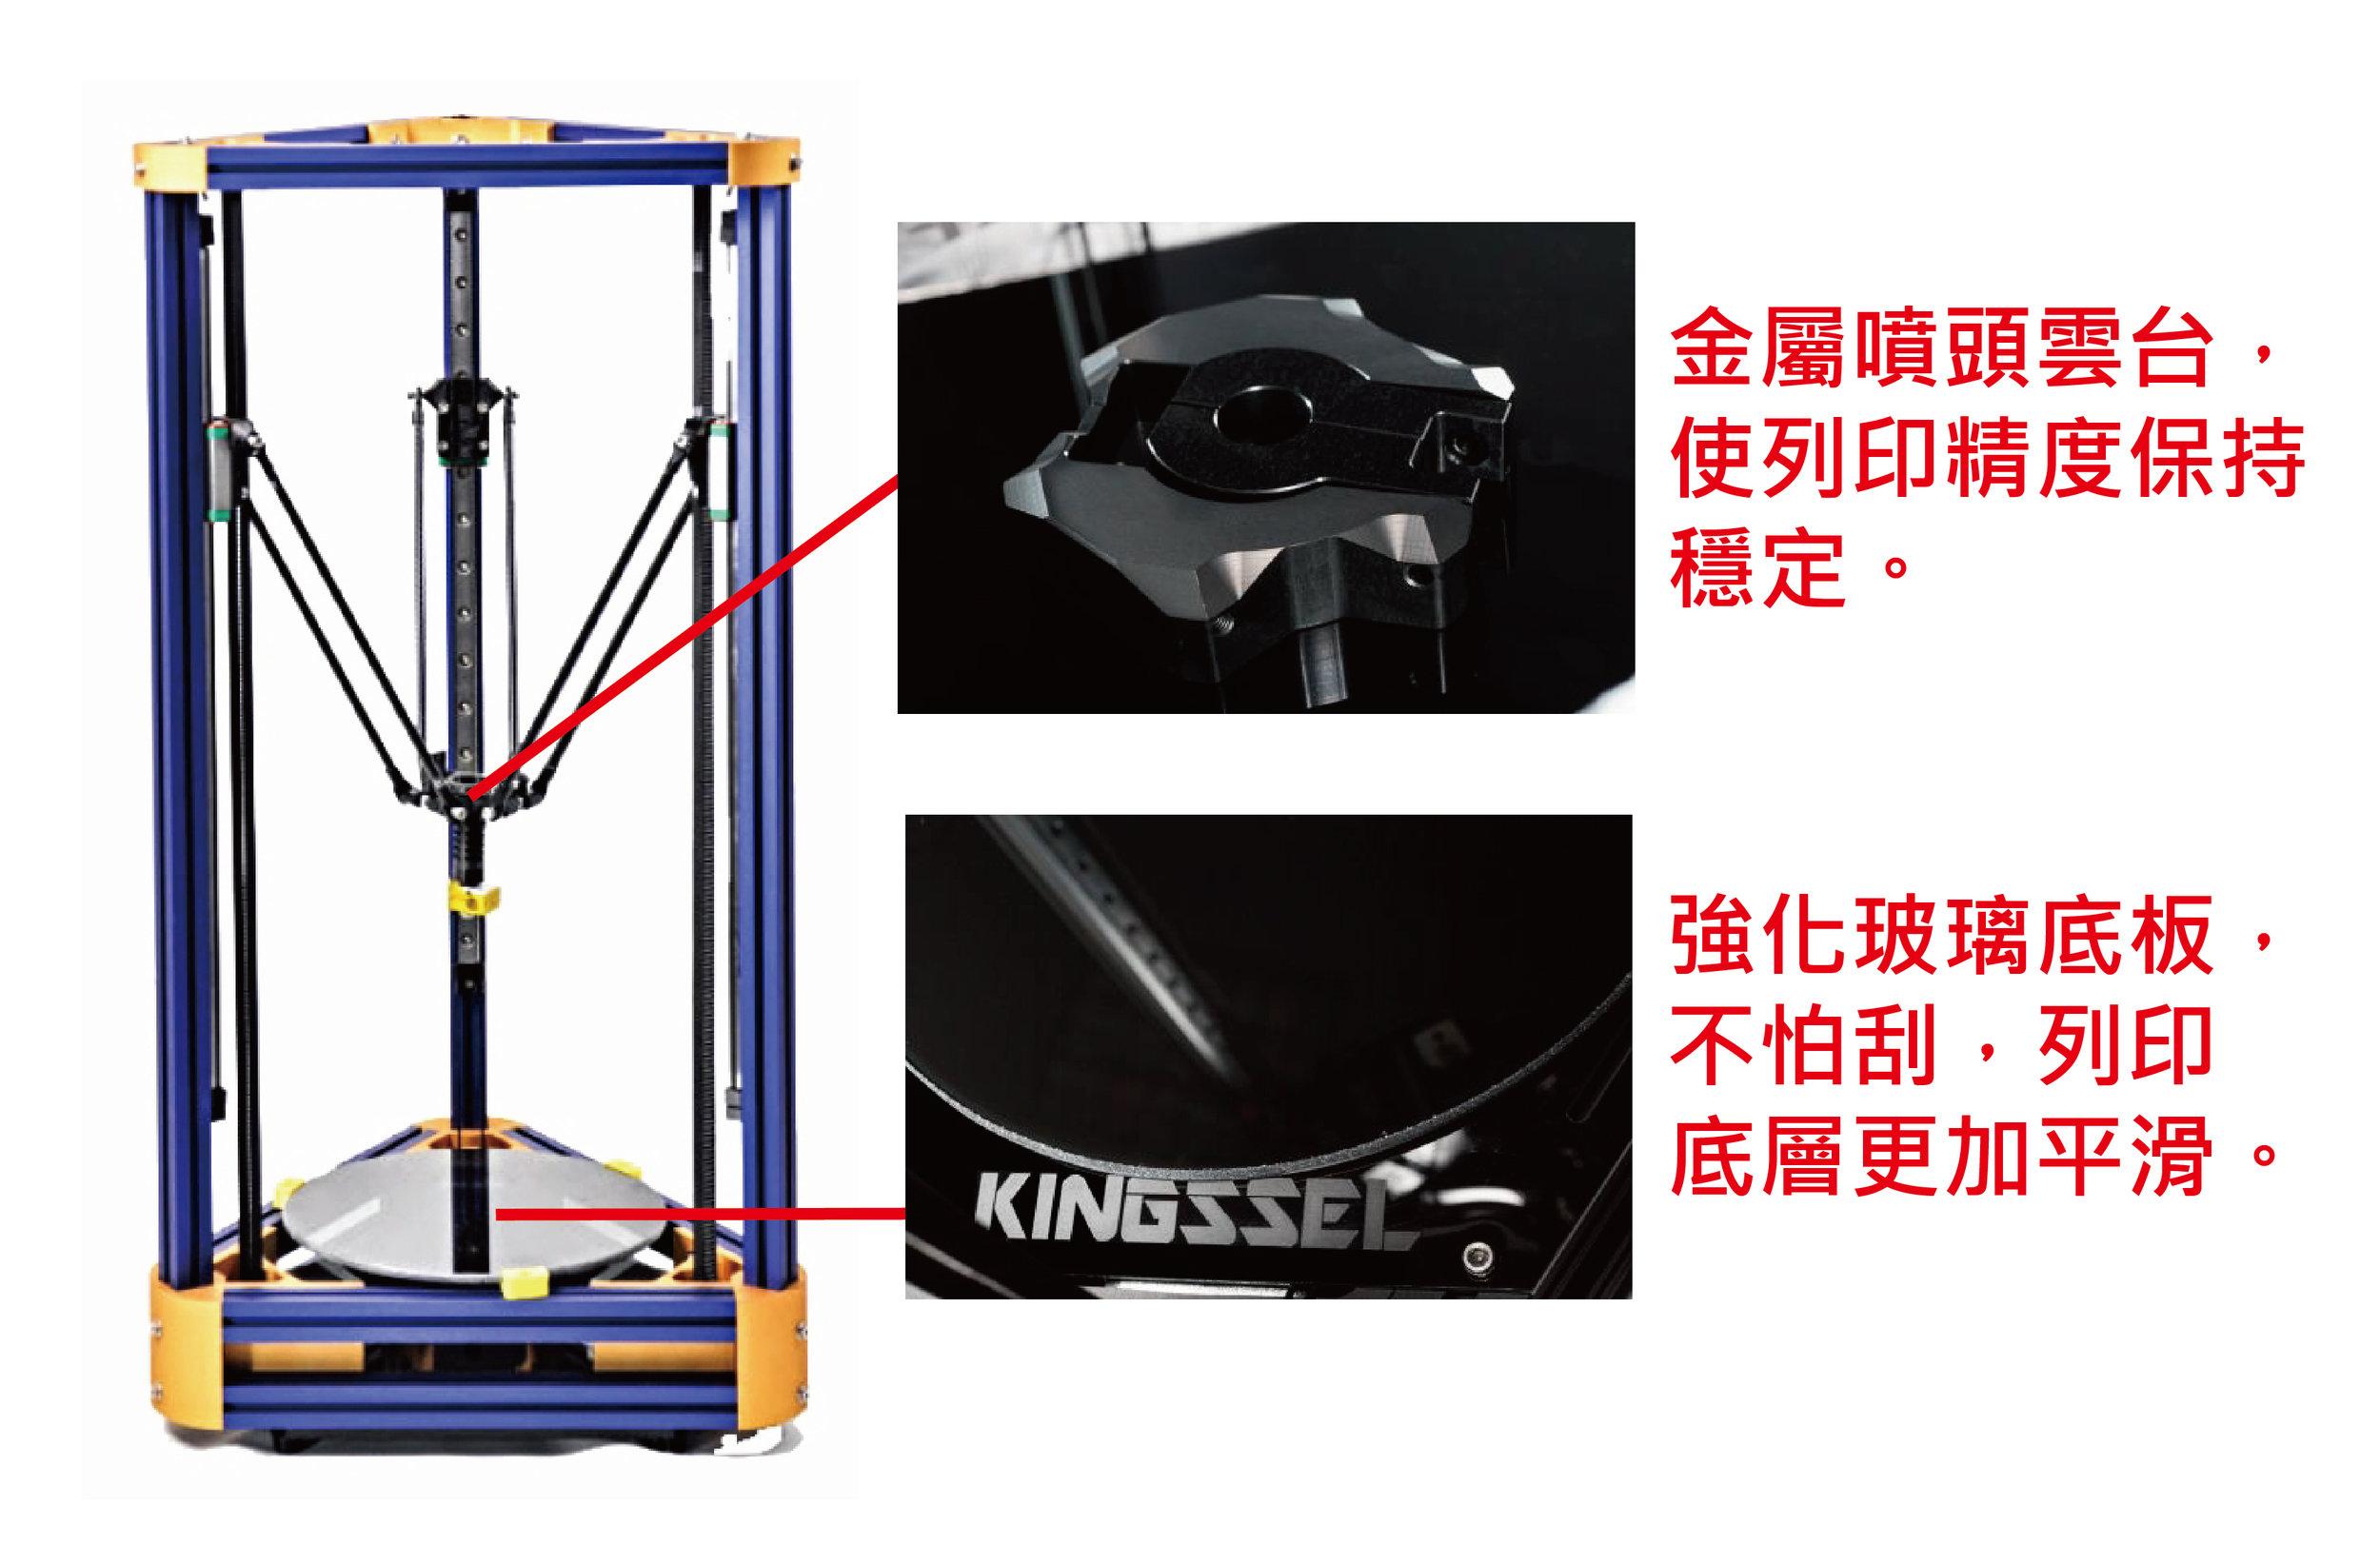 KINGSSEL3040 3D列印機 國王機 p3.jpg